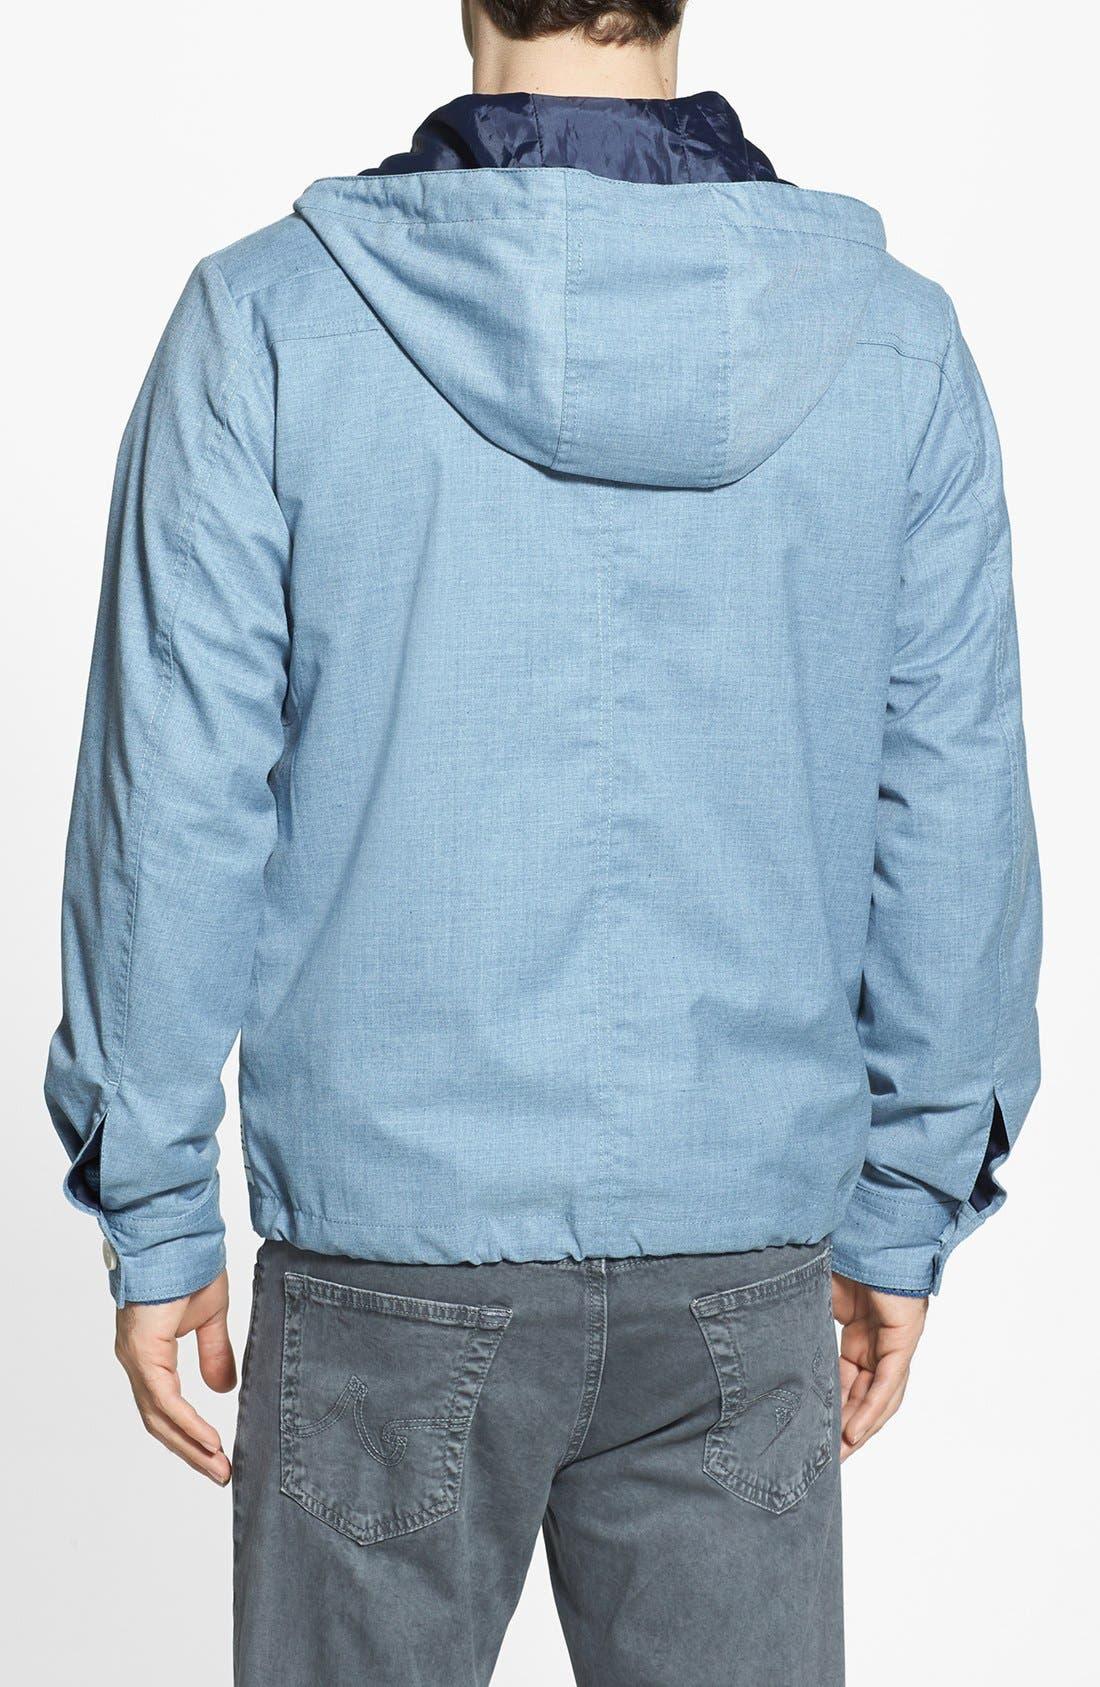 Alternate Image 2  - Moods of Norway 'Jon Andre' Cotton Zip Jacket